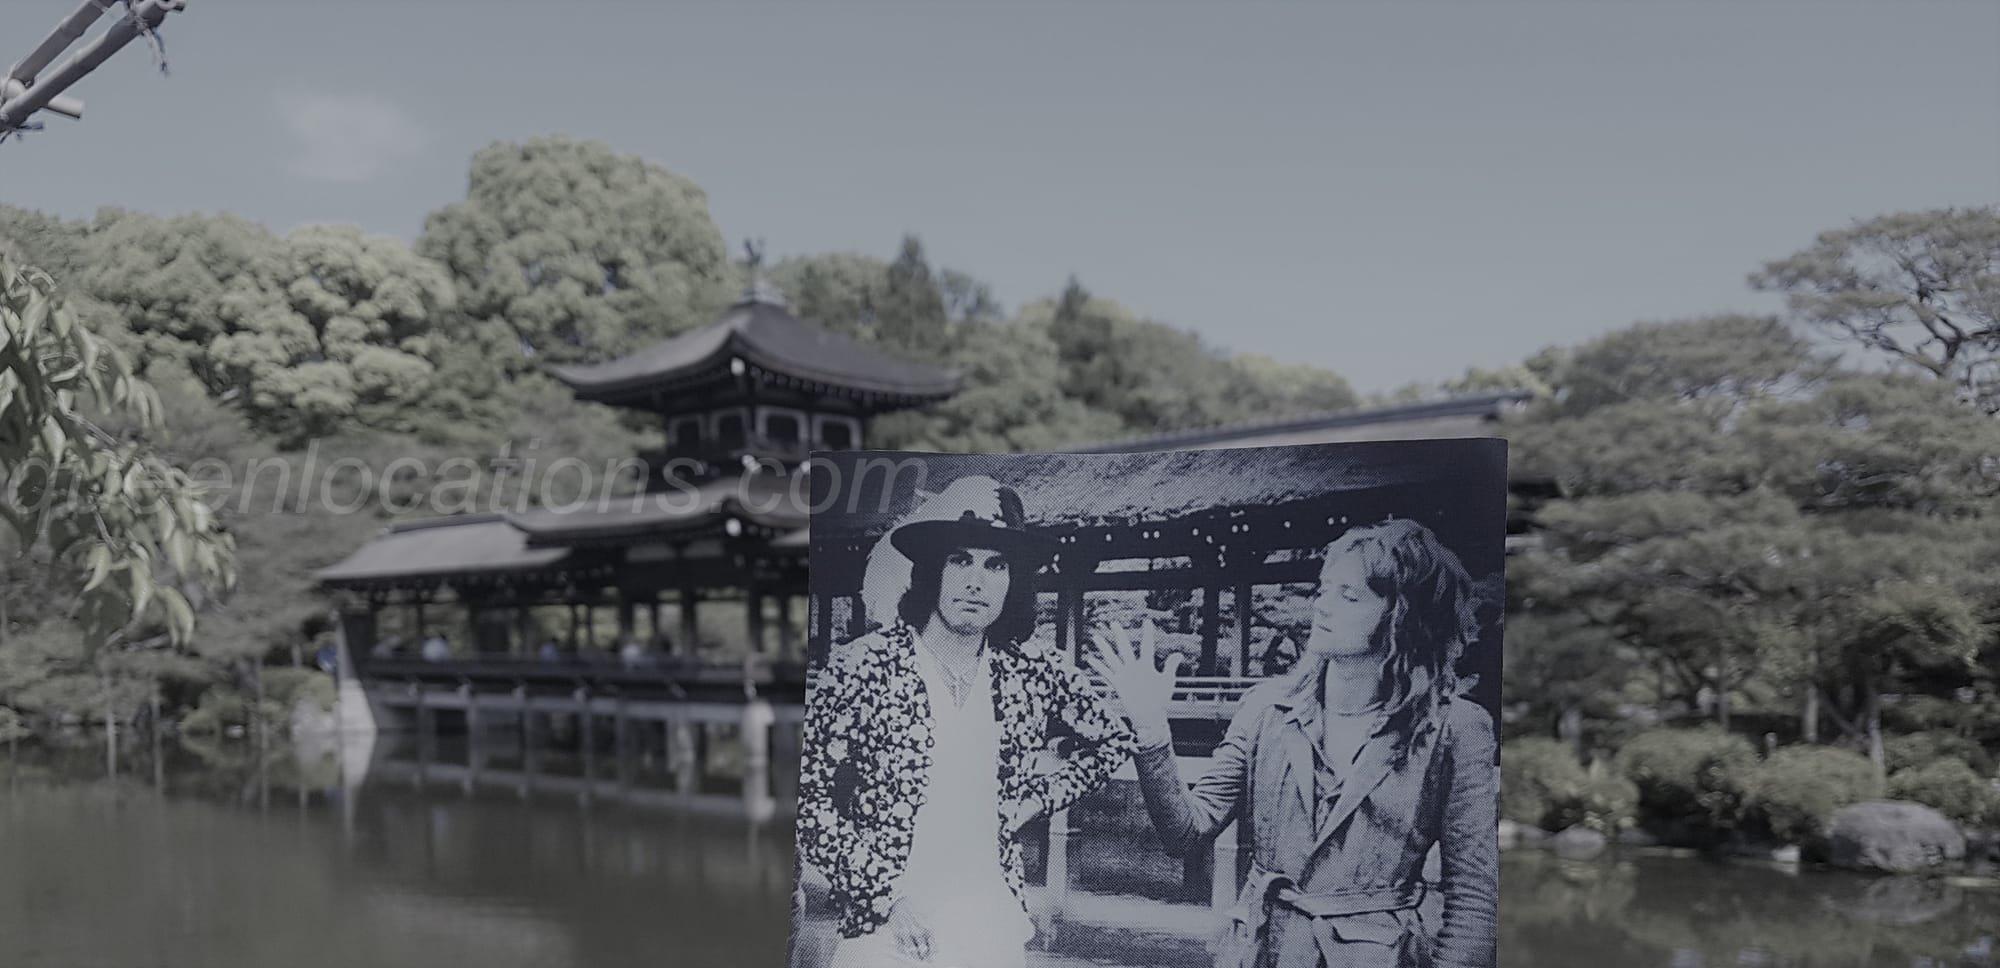 Queen Heian Shrine